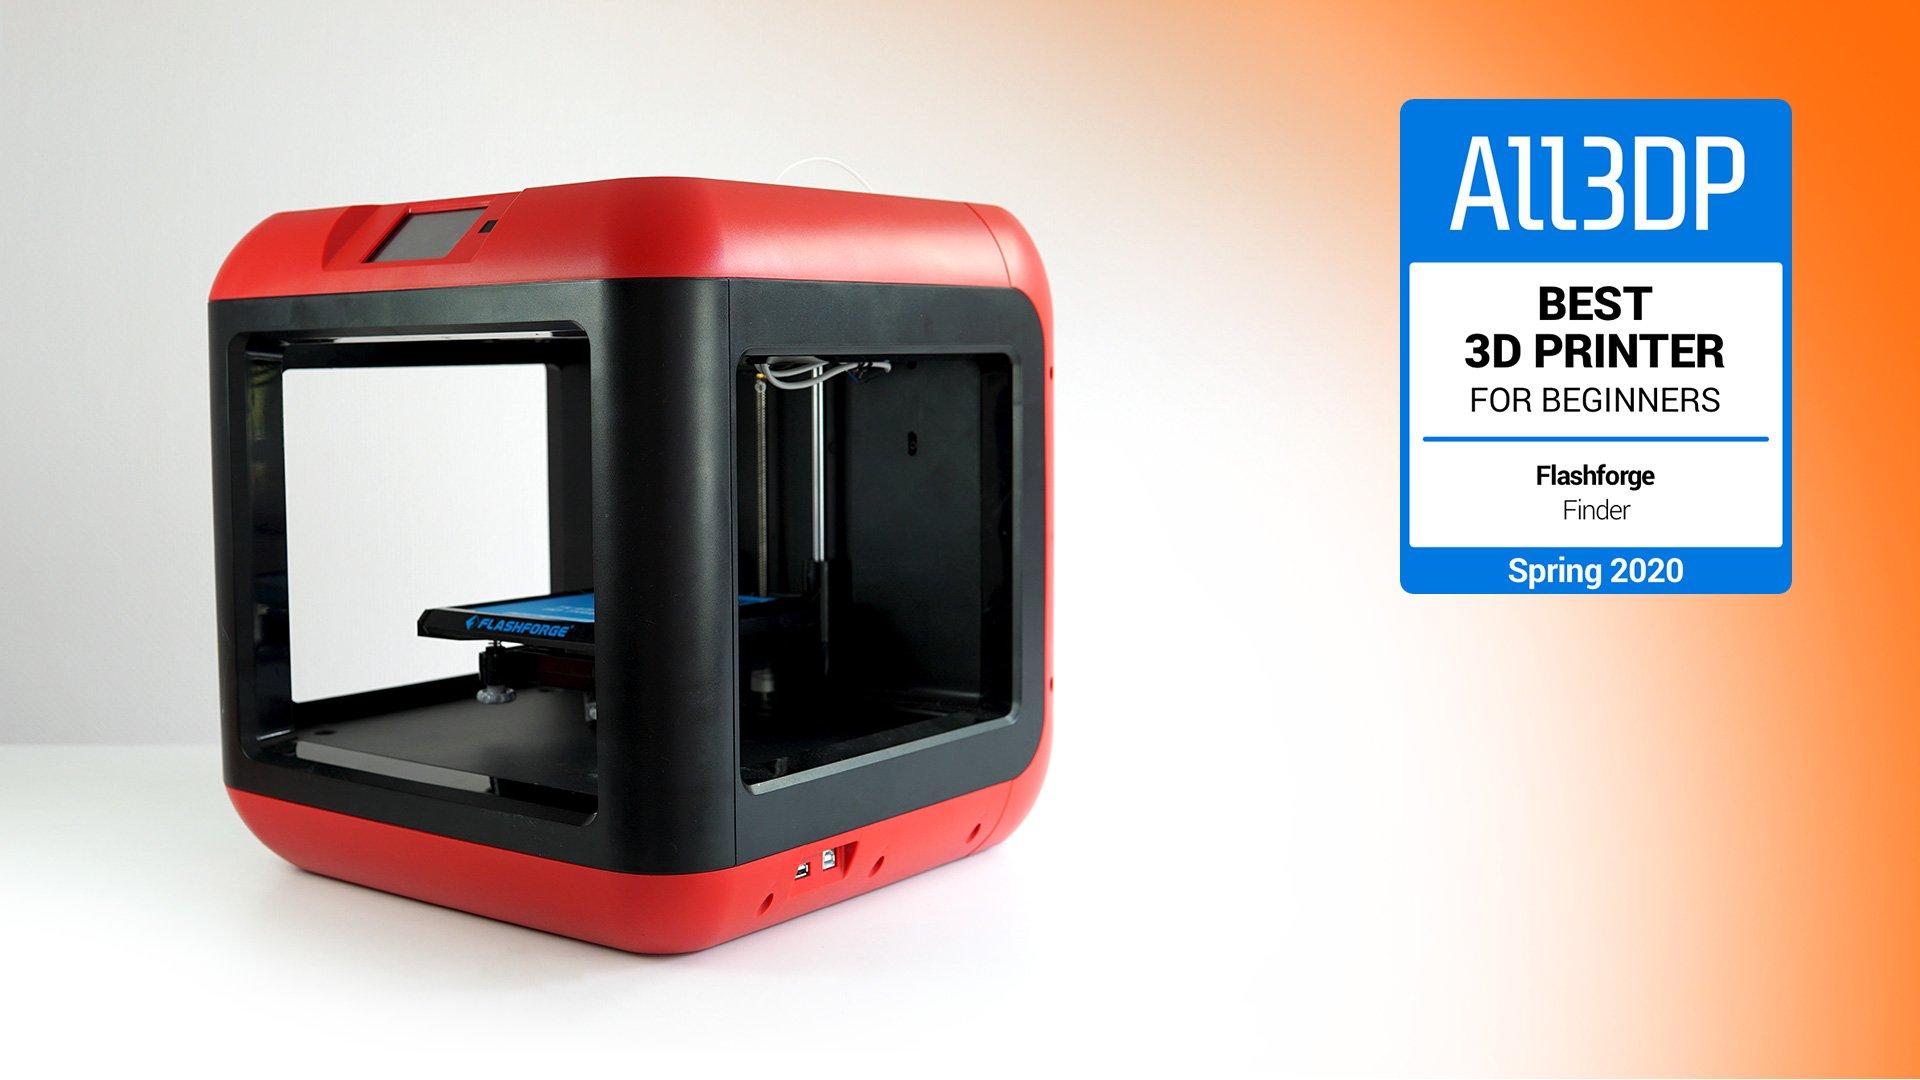 Flashforge Finder Review: Best 3D Printer for Beginners 2020   All3DP